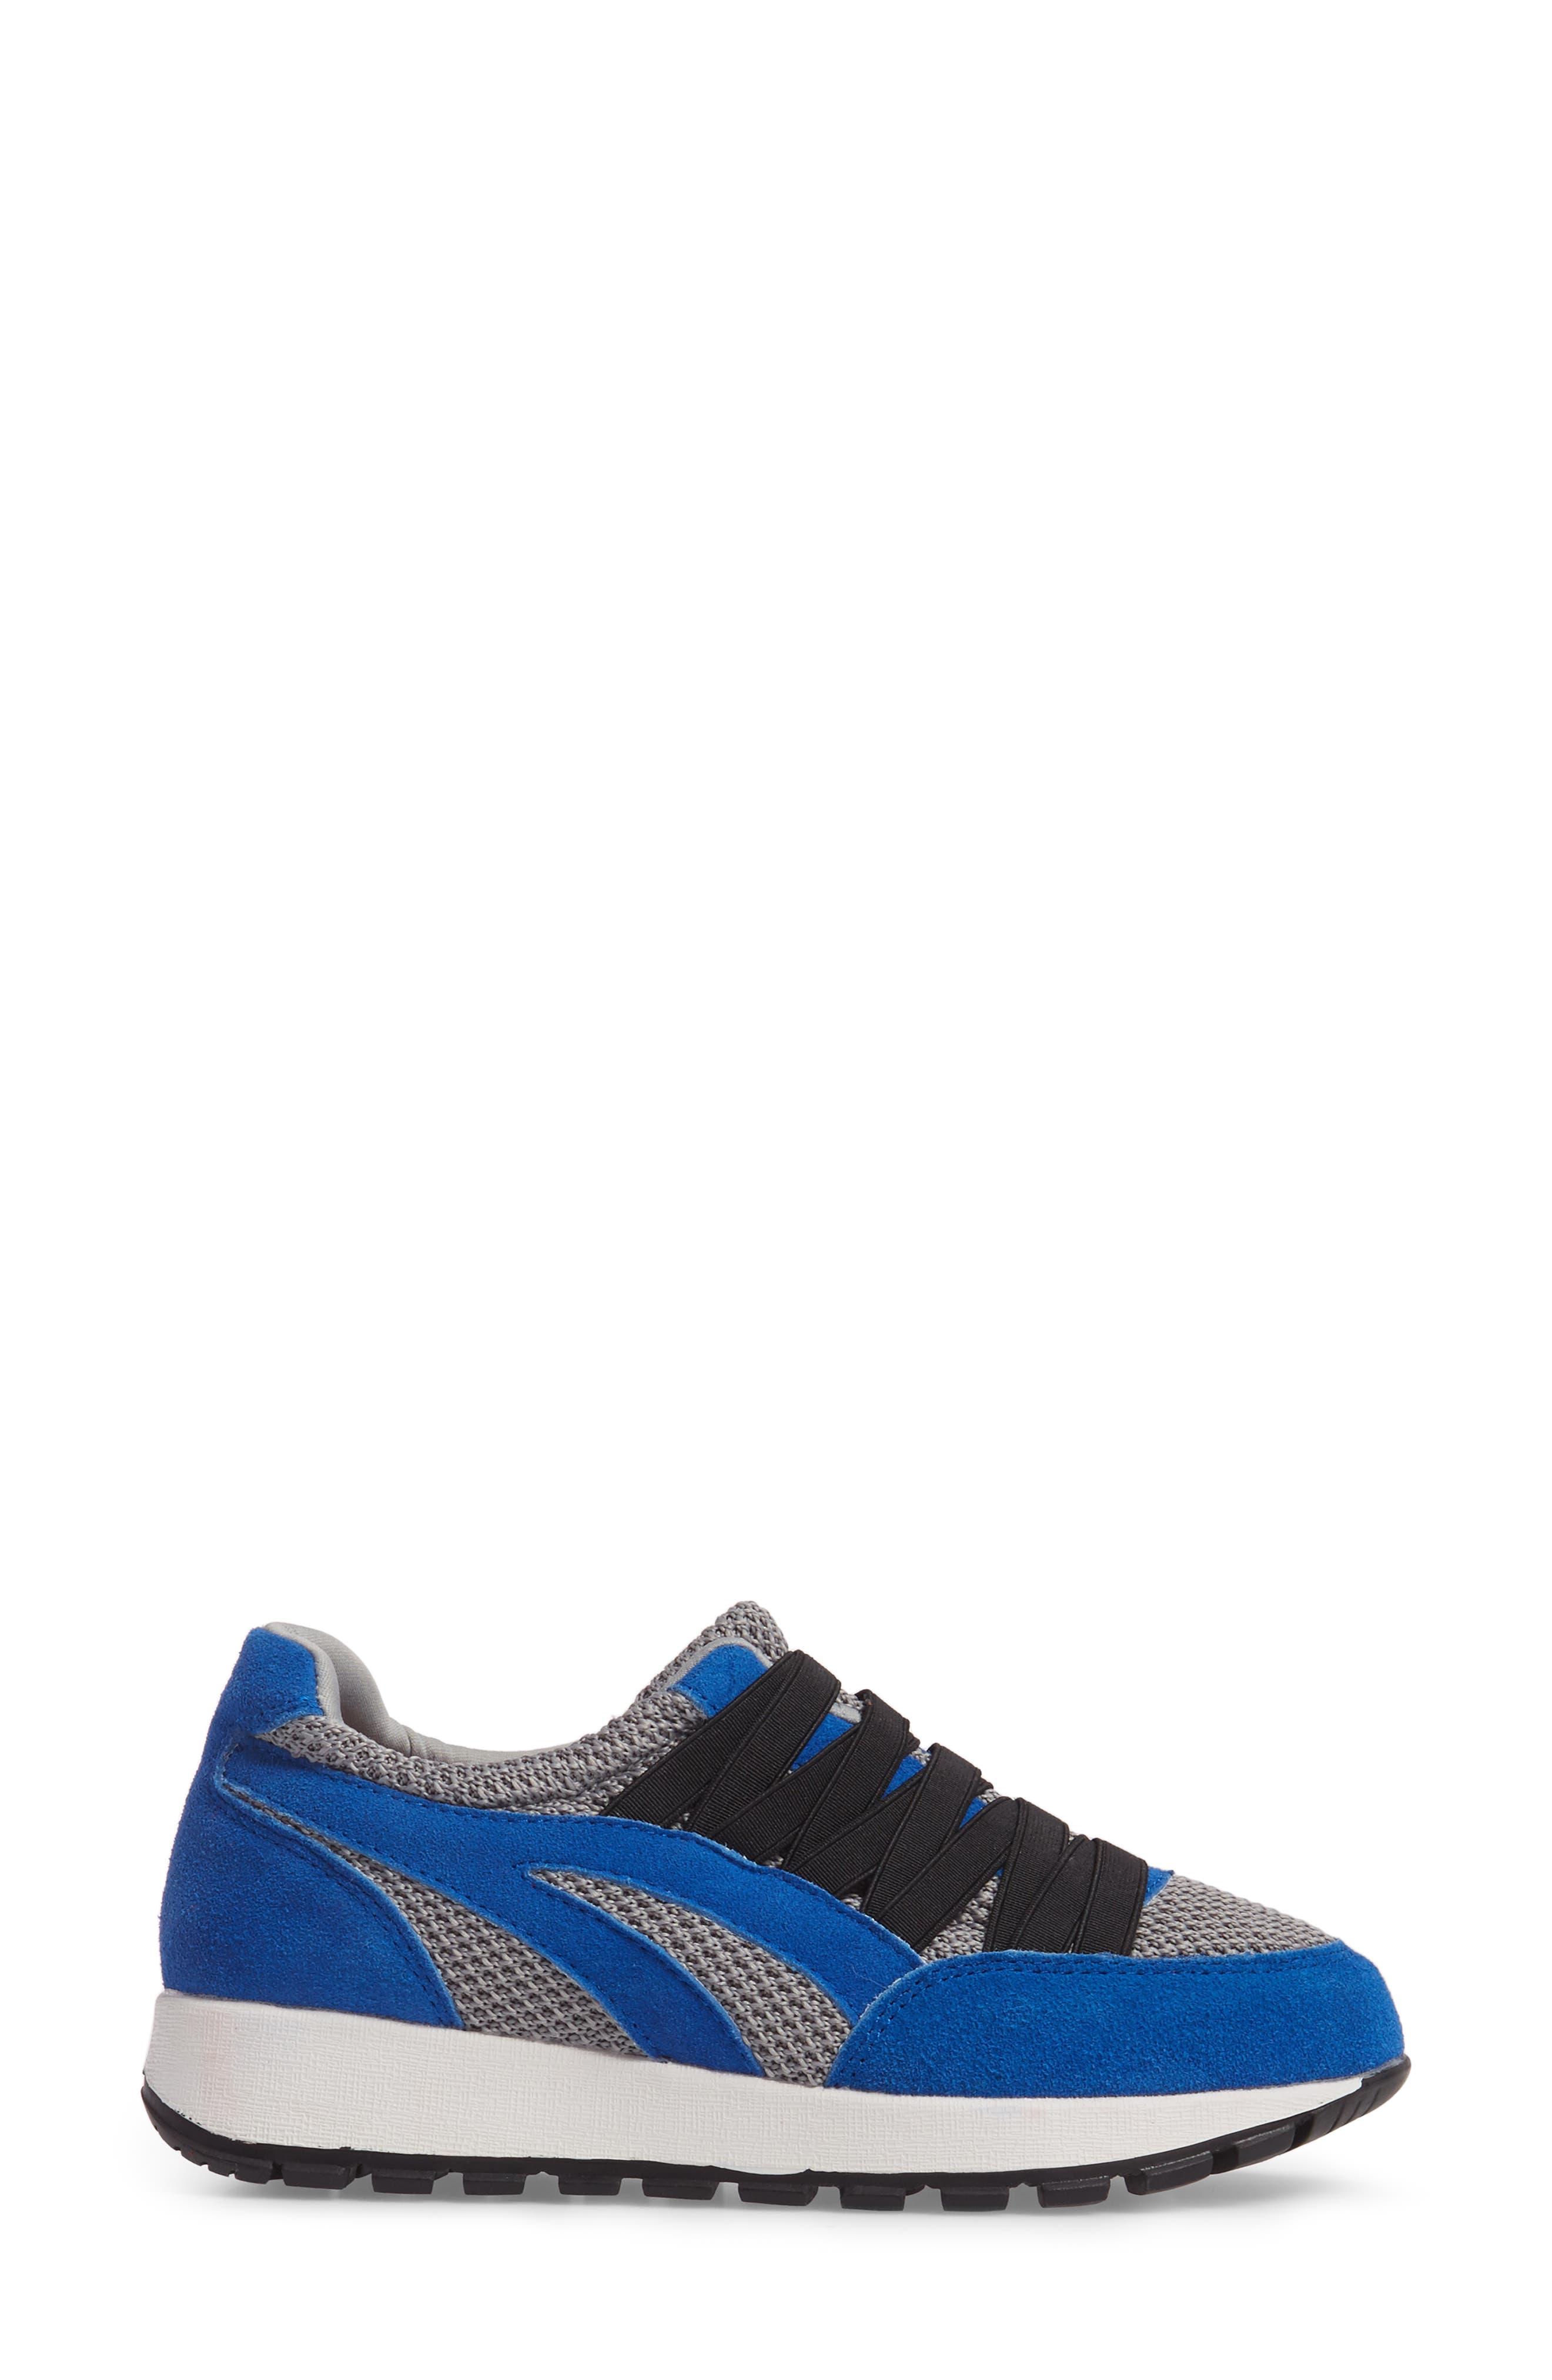 Bernie Mev Tara Cano Sneaker,                             Alternate thumbnail 3, color,                             ROYAL BLUE/ GREY FABRIC